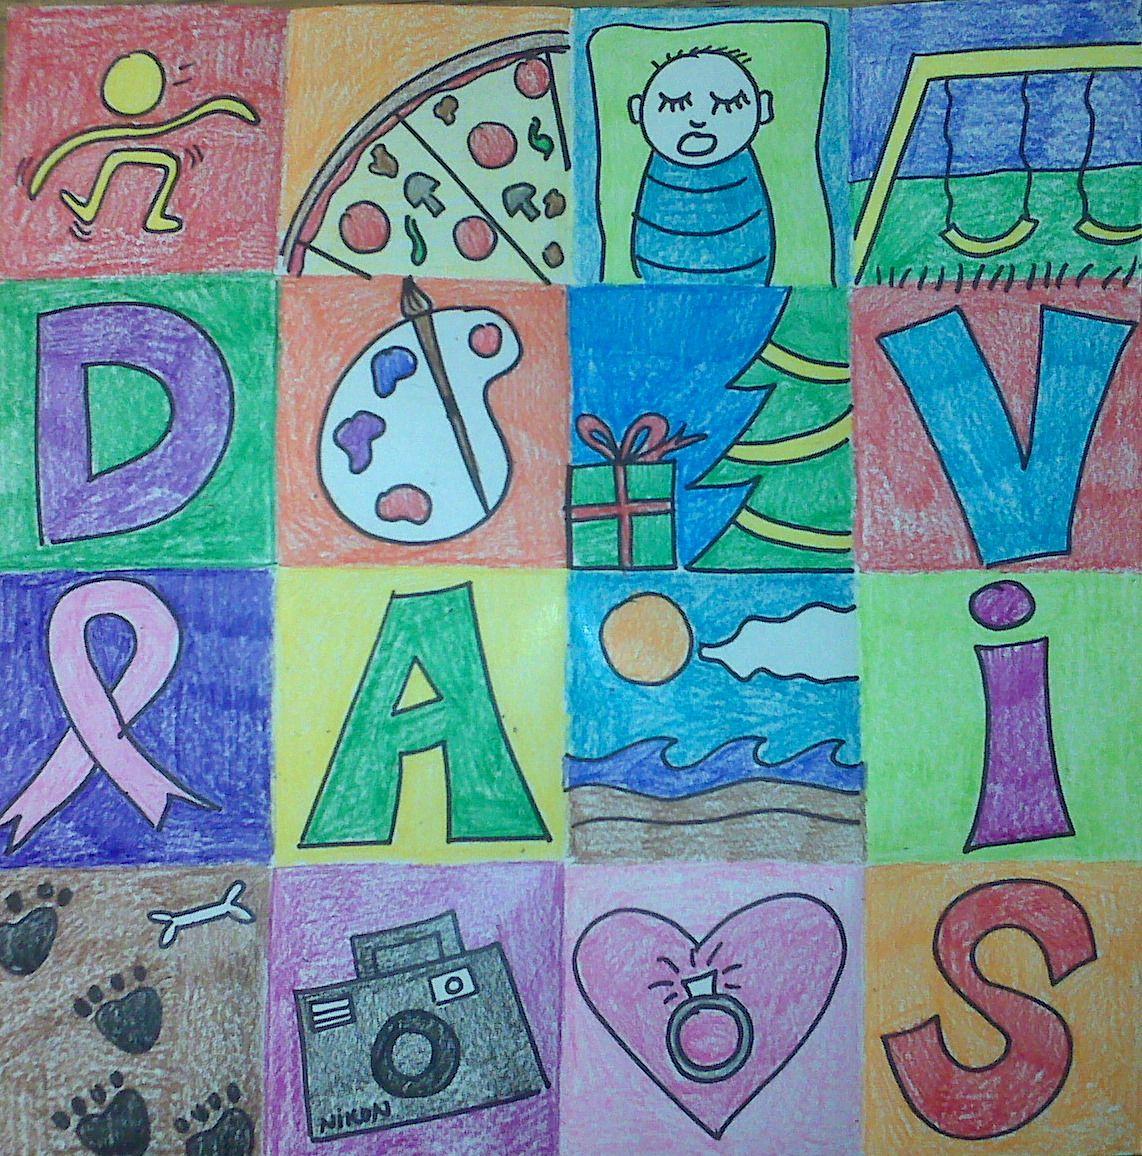 Idgrid Jpg 1 142 1 156 Pixels School Art Projects Back To School Art Elementary Art Projects